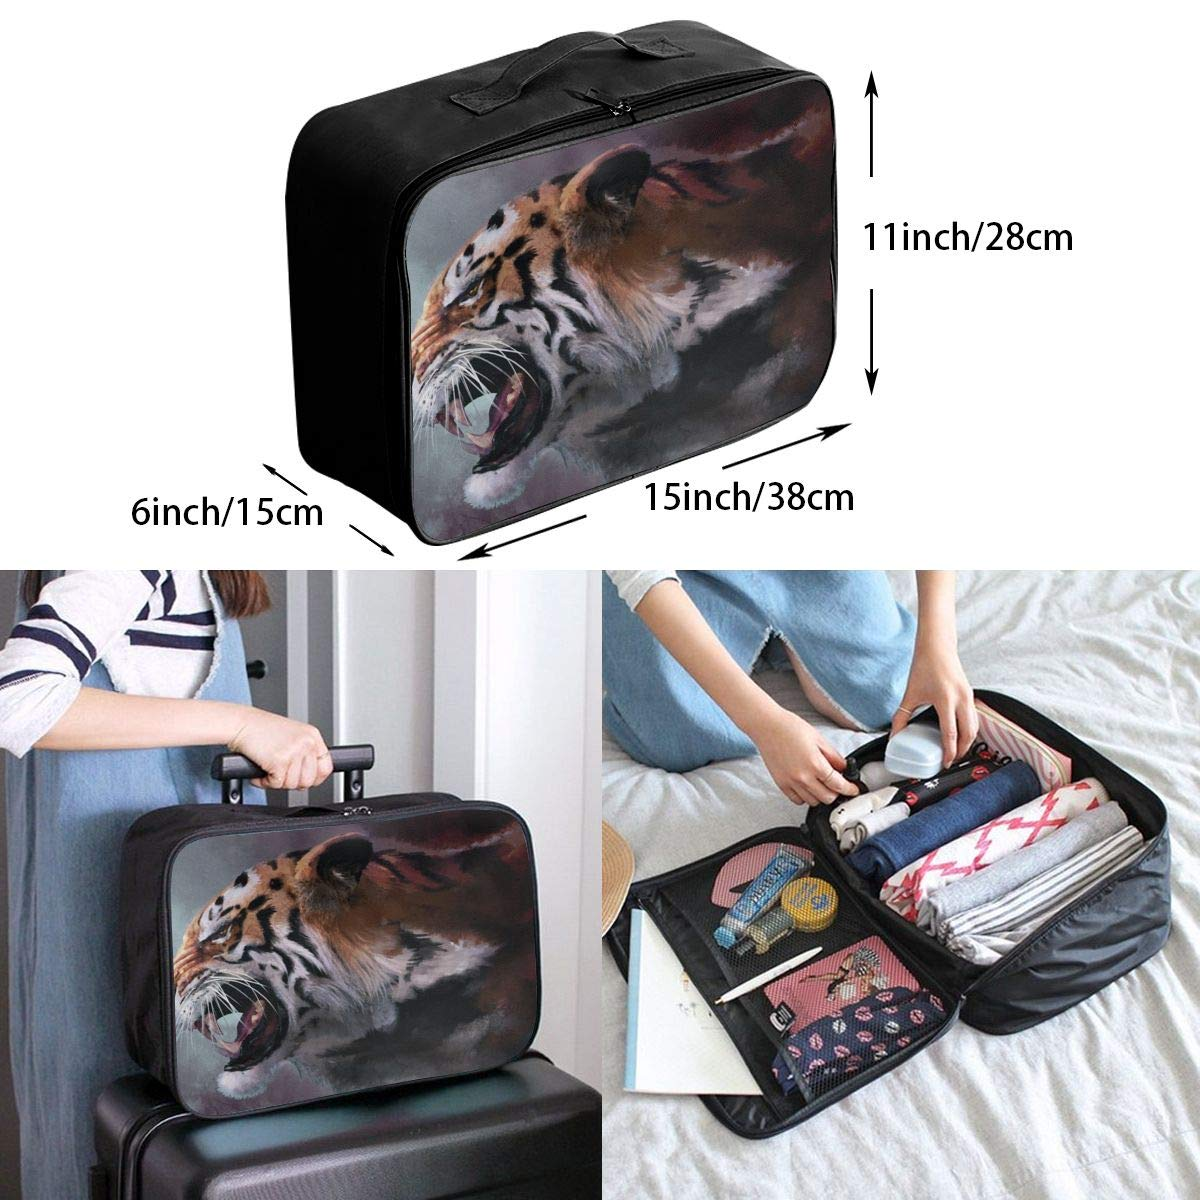 Travel Luggage Duffle Bag Lightweight Portable Handbag Tiger Pattern Large Capacity Waterproof Foldable Storage Tote